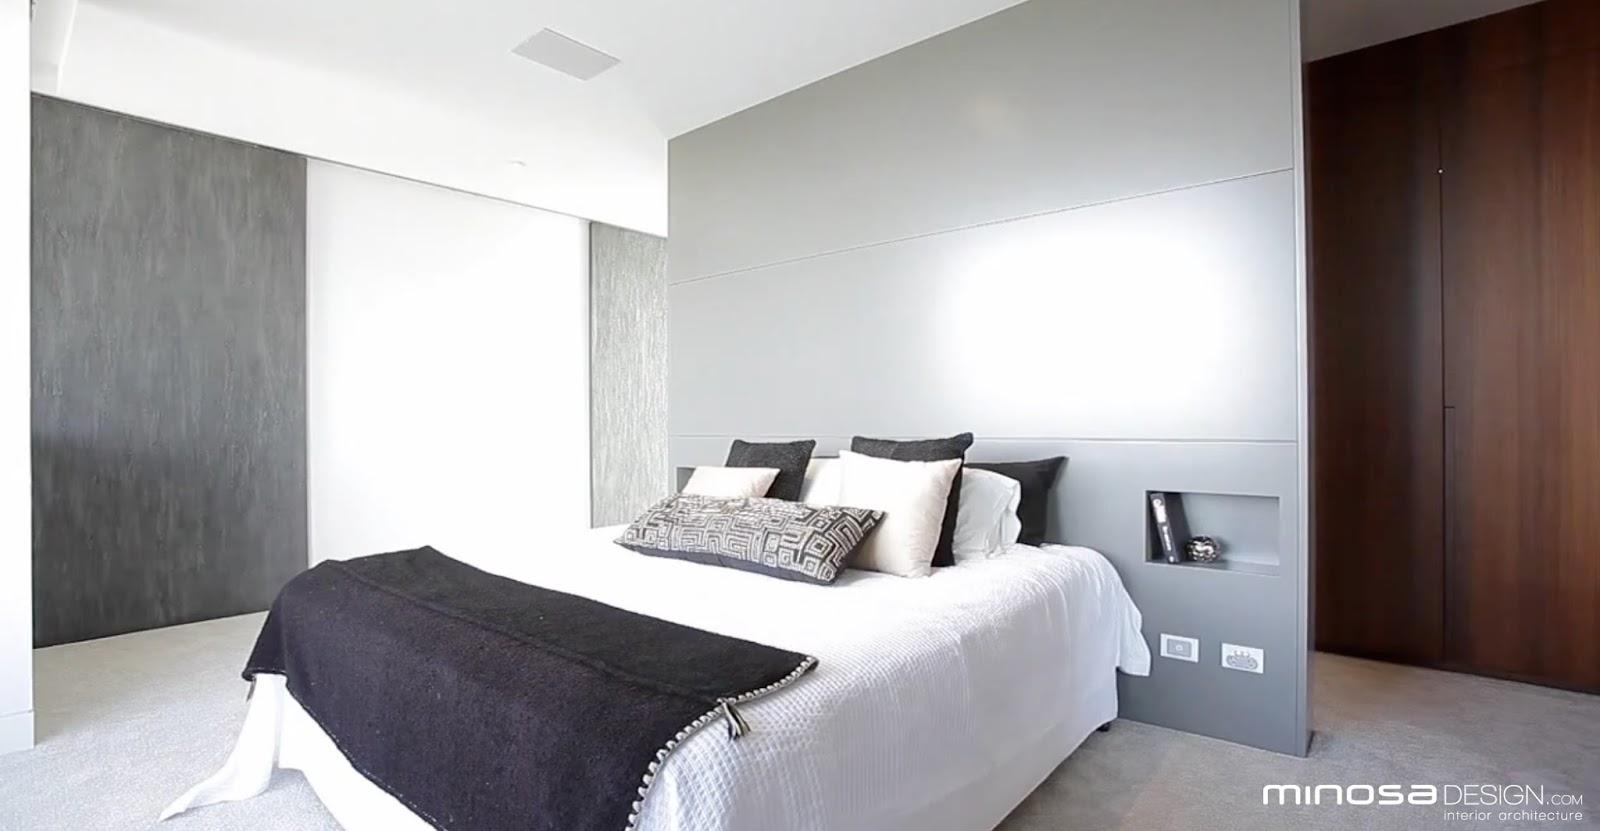 Minosa: 20 Wallangra Rd Dover Heights - Kitchen & bathrooms designed ...